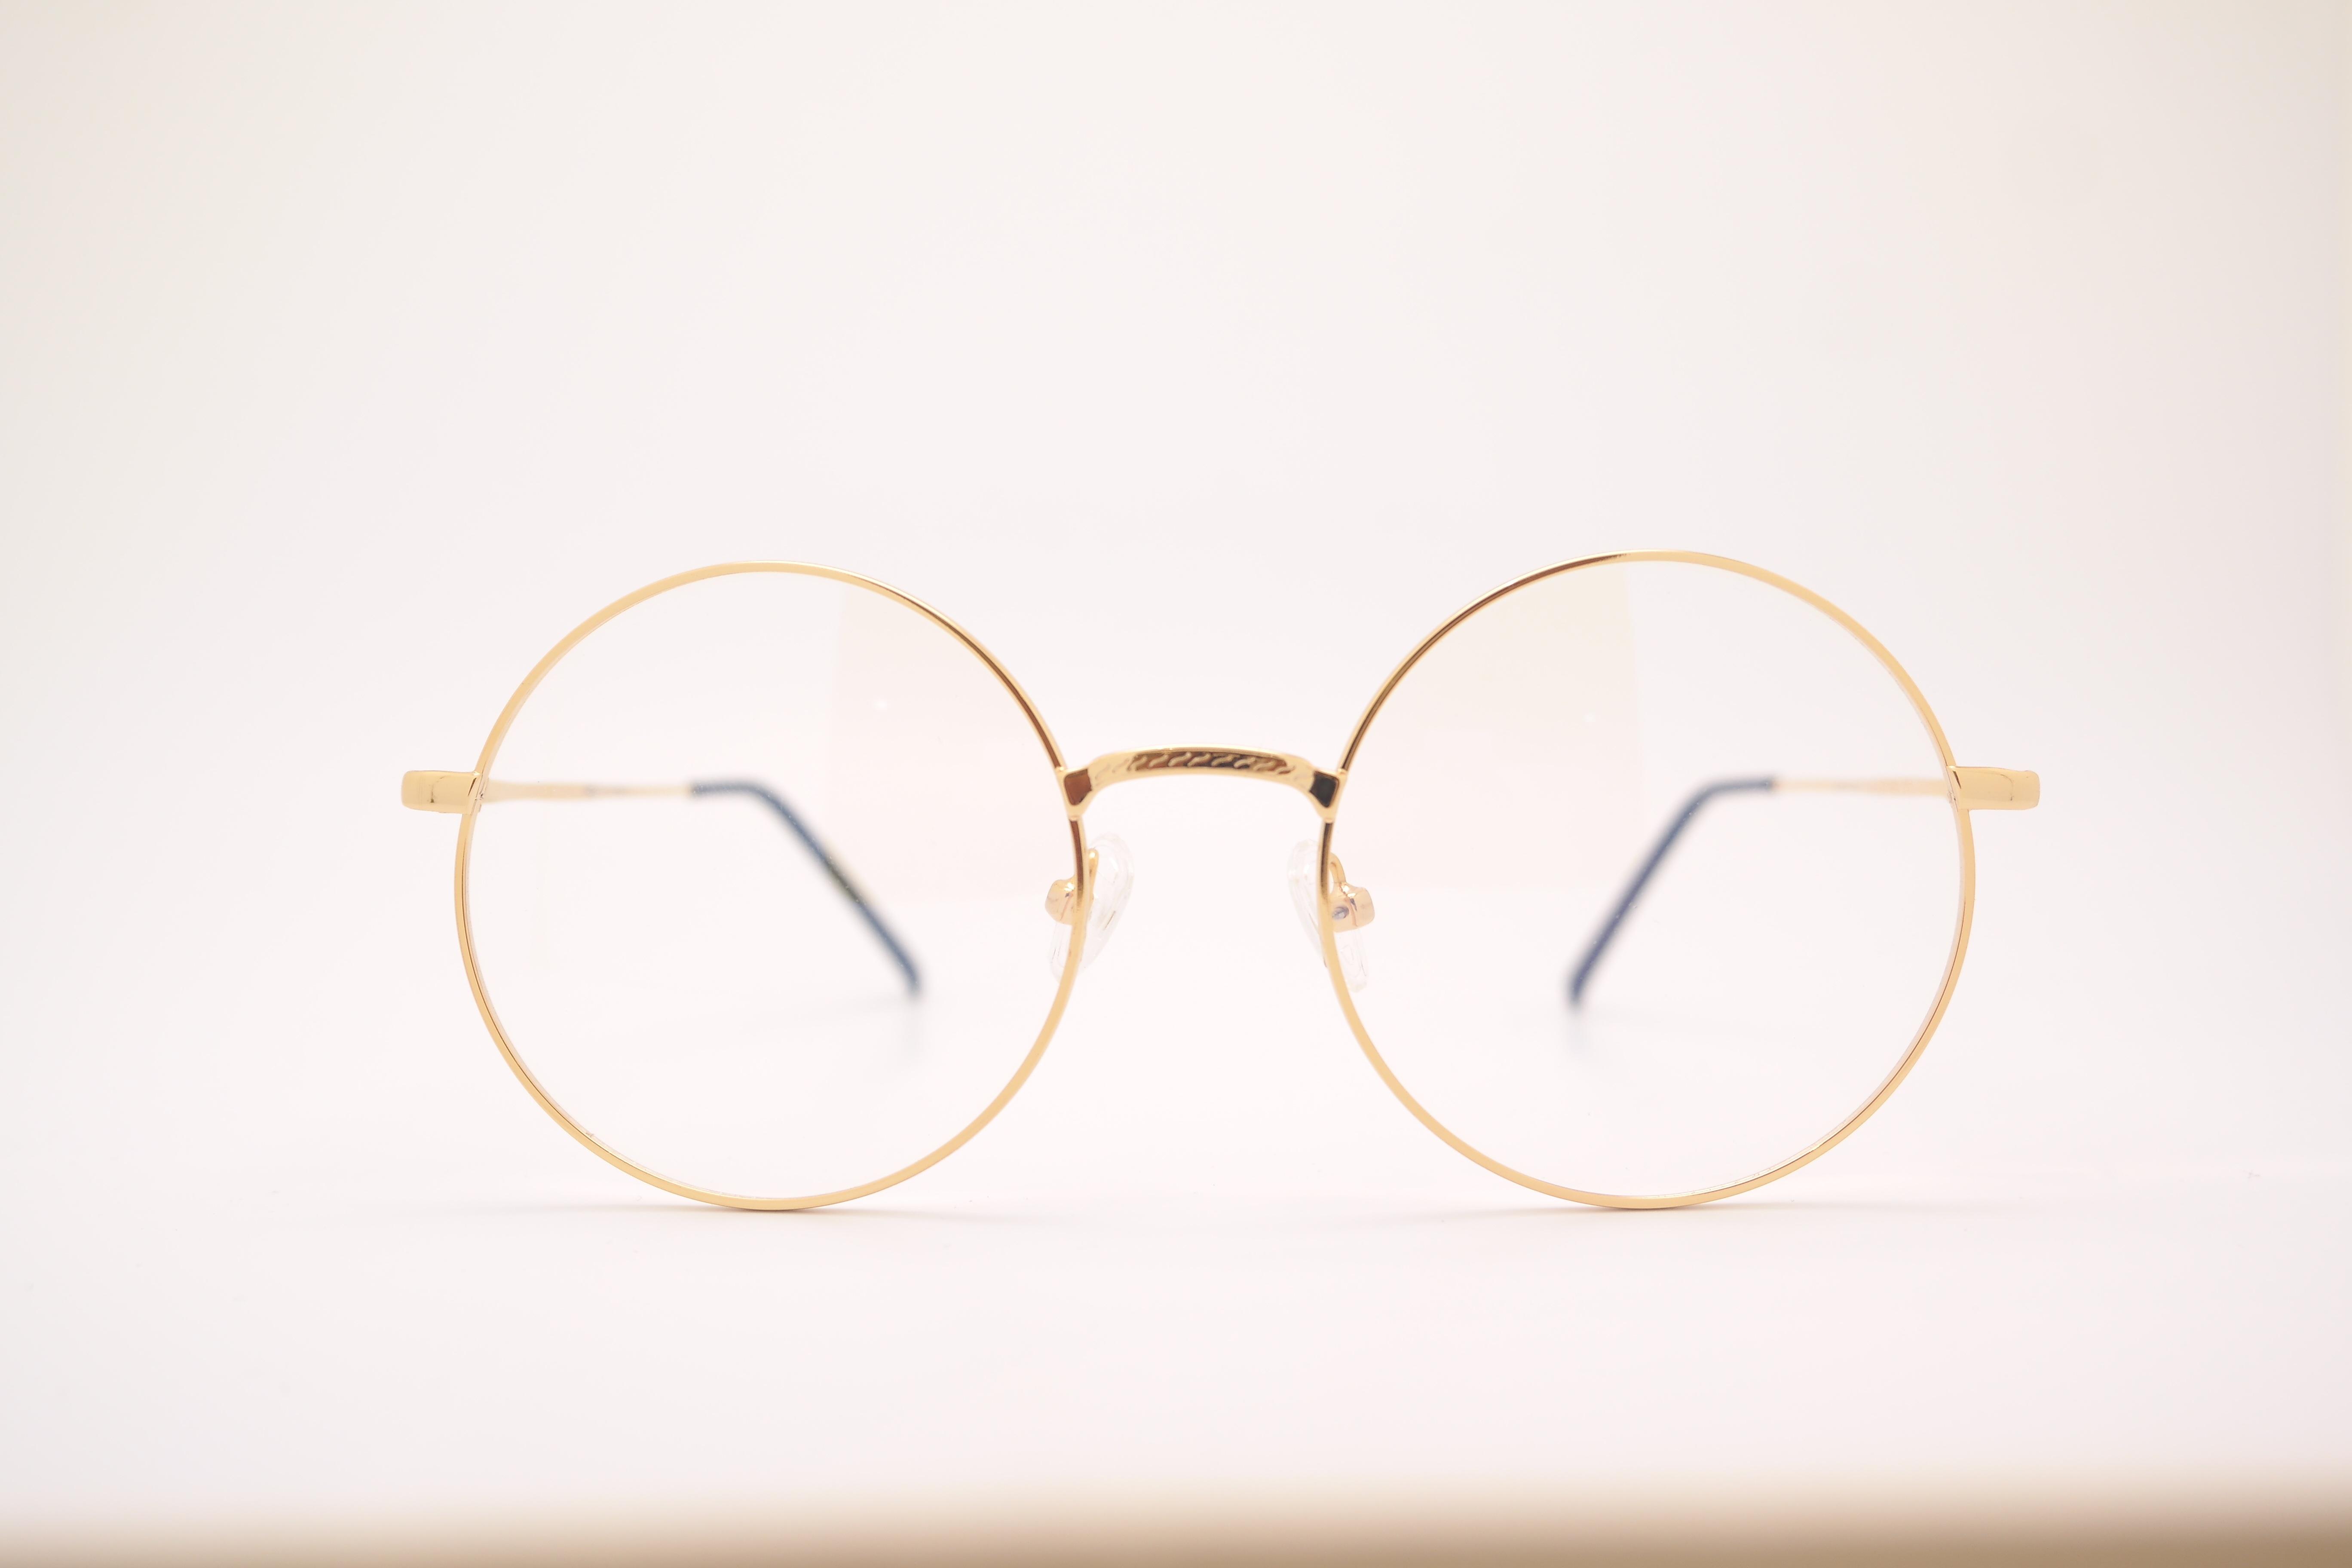 1ed7847f96d2 gylden gået i stykker cirkel font solbriller briller briller form briller  glas vision pleje lykketræf engel